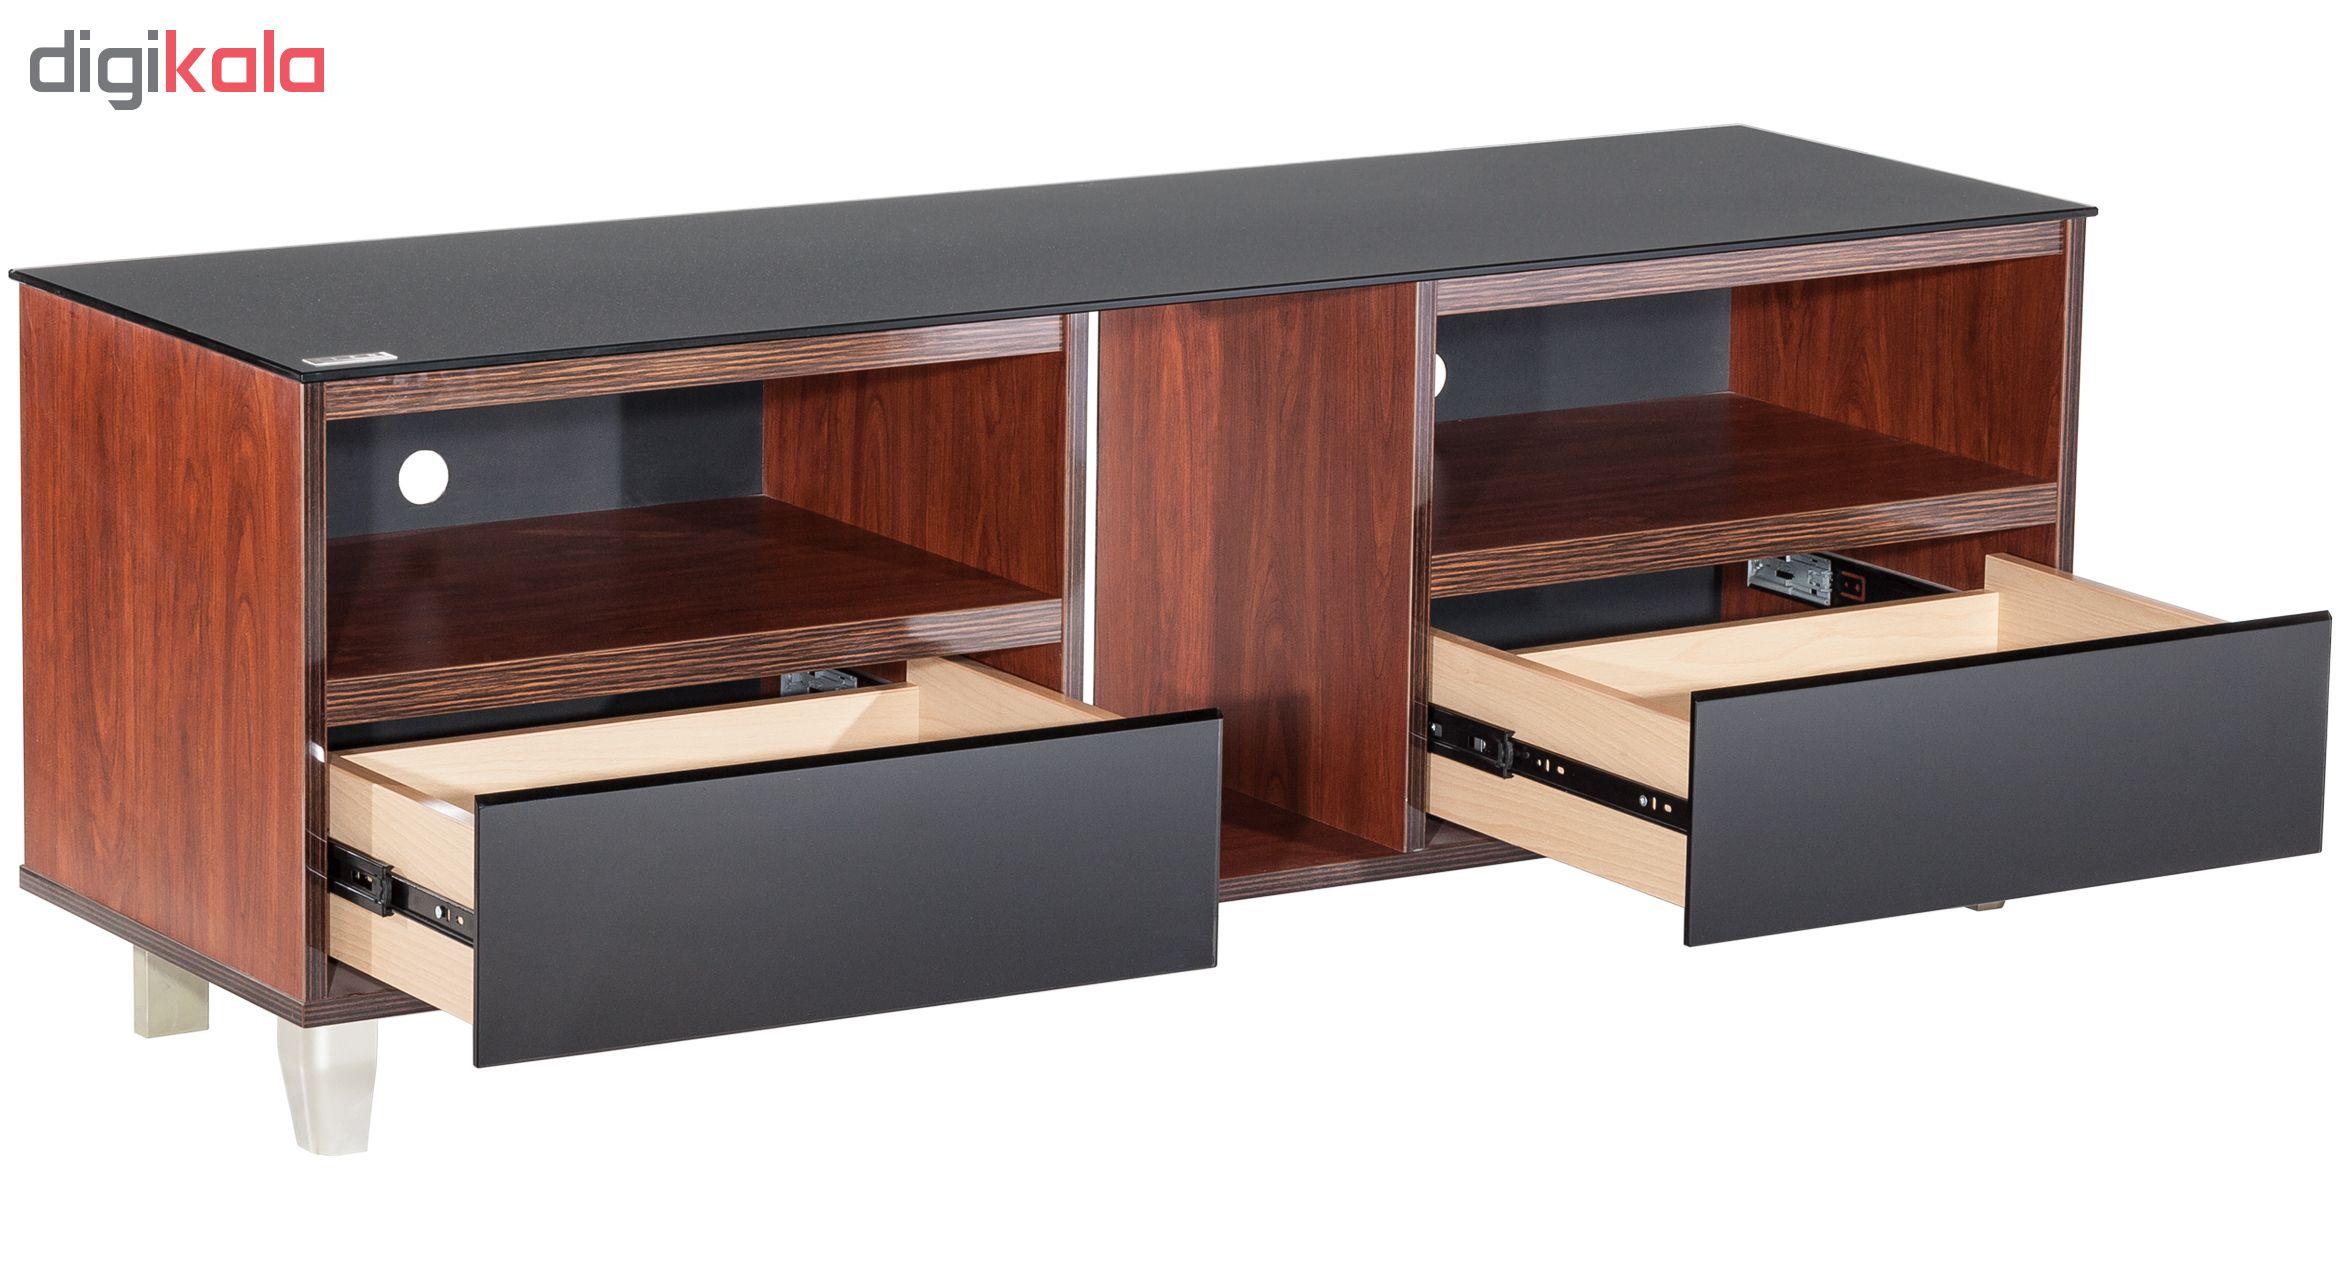 خرید اینترنتی میز تلویزیون آیلکس مدل VIOLA-BRBL-150 اورجینال